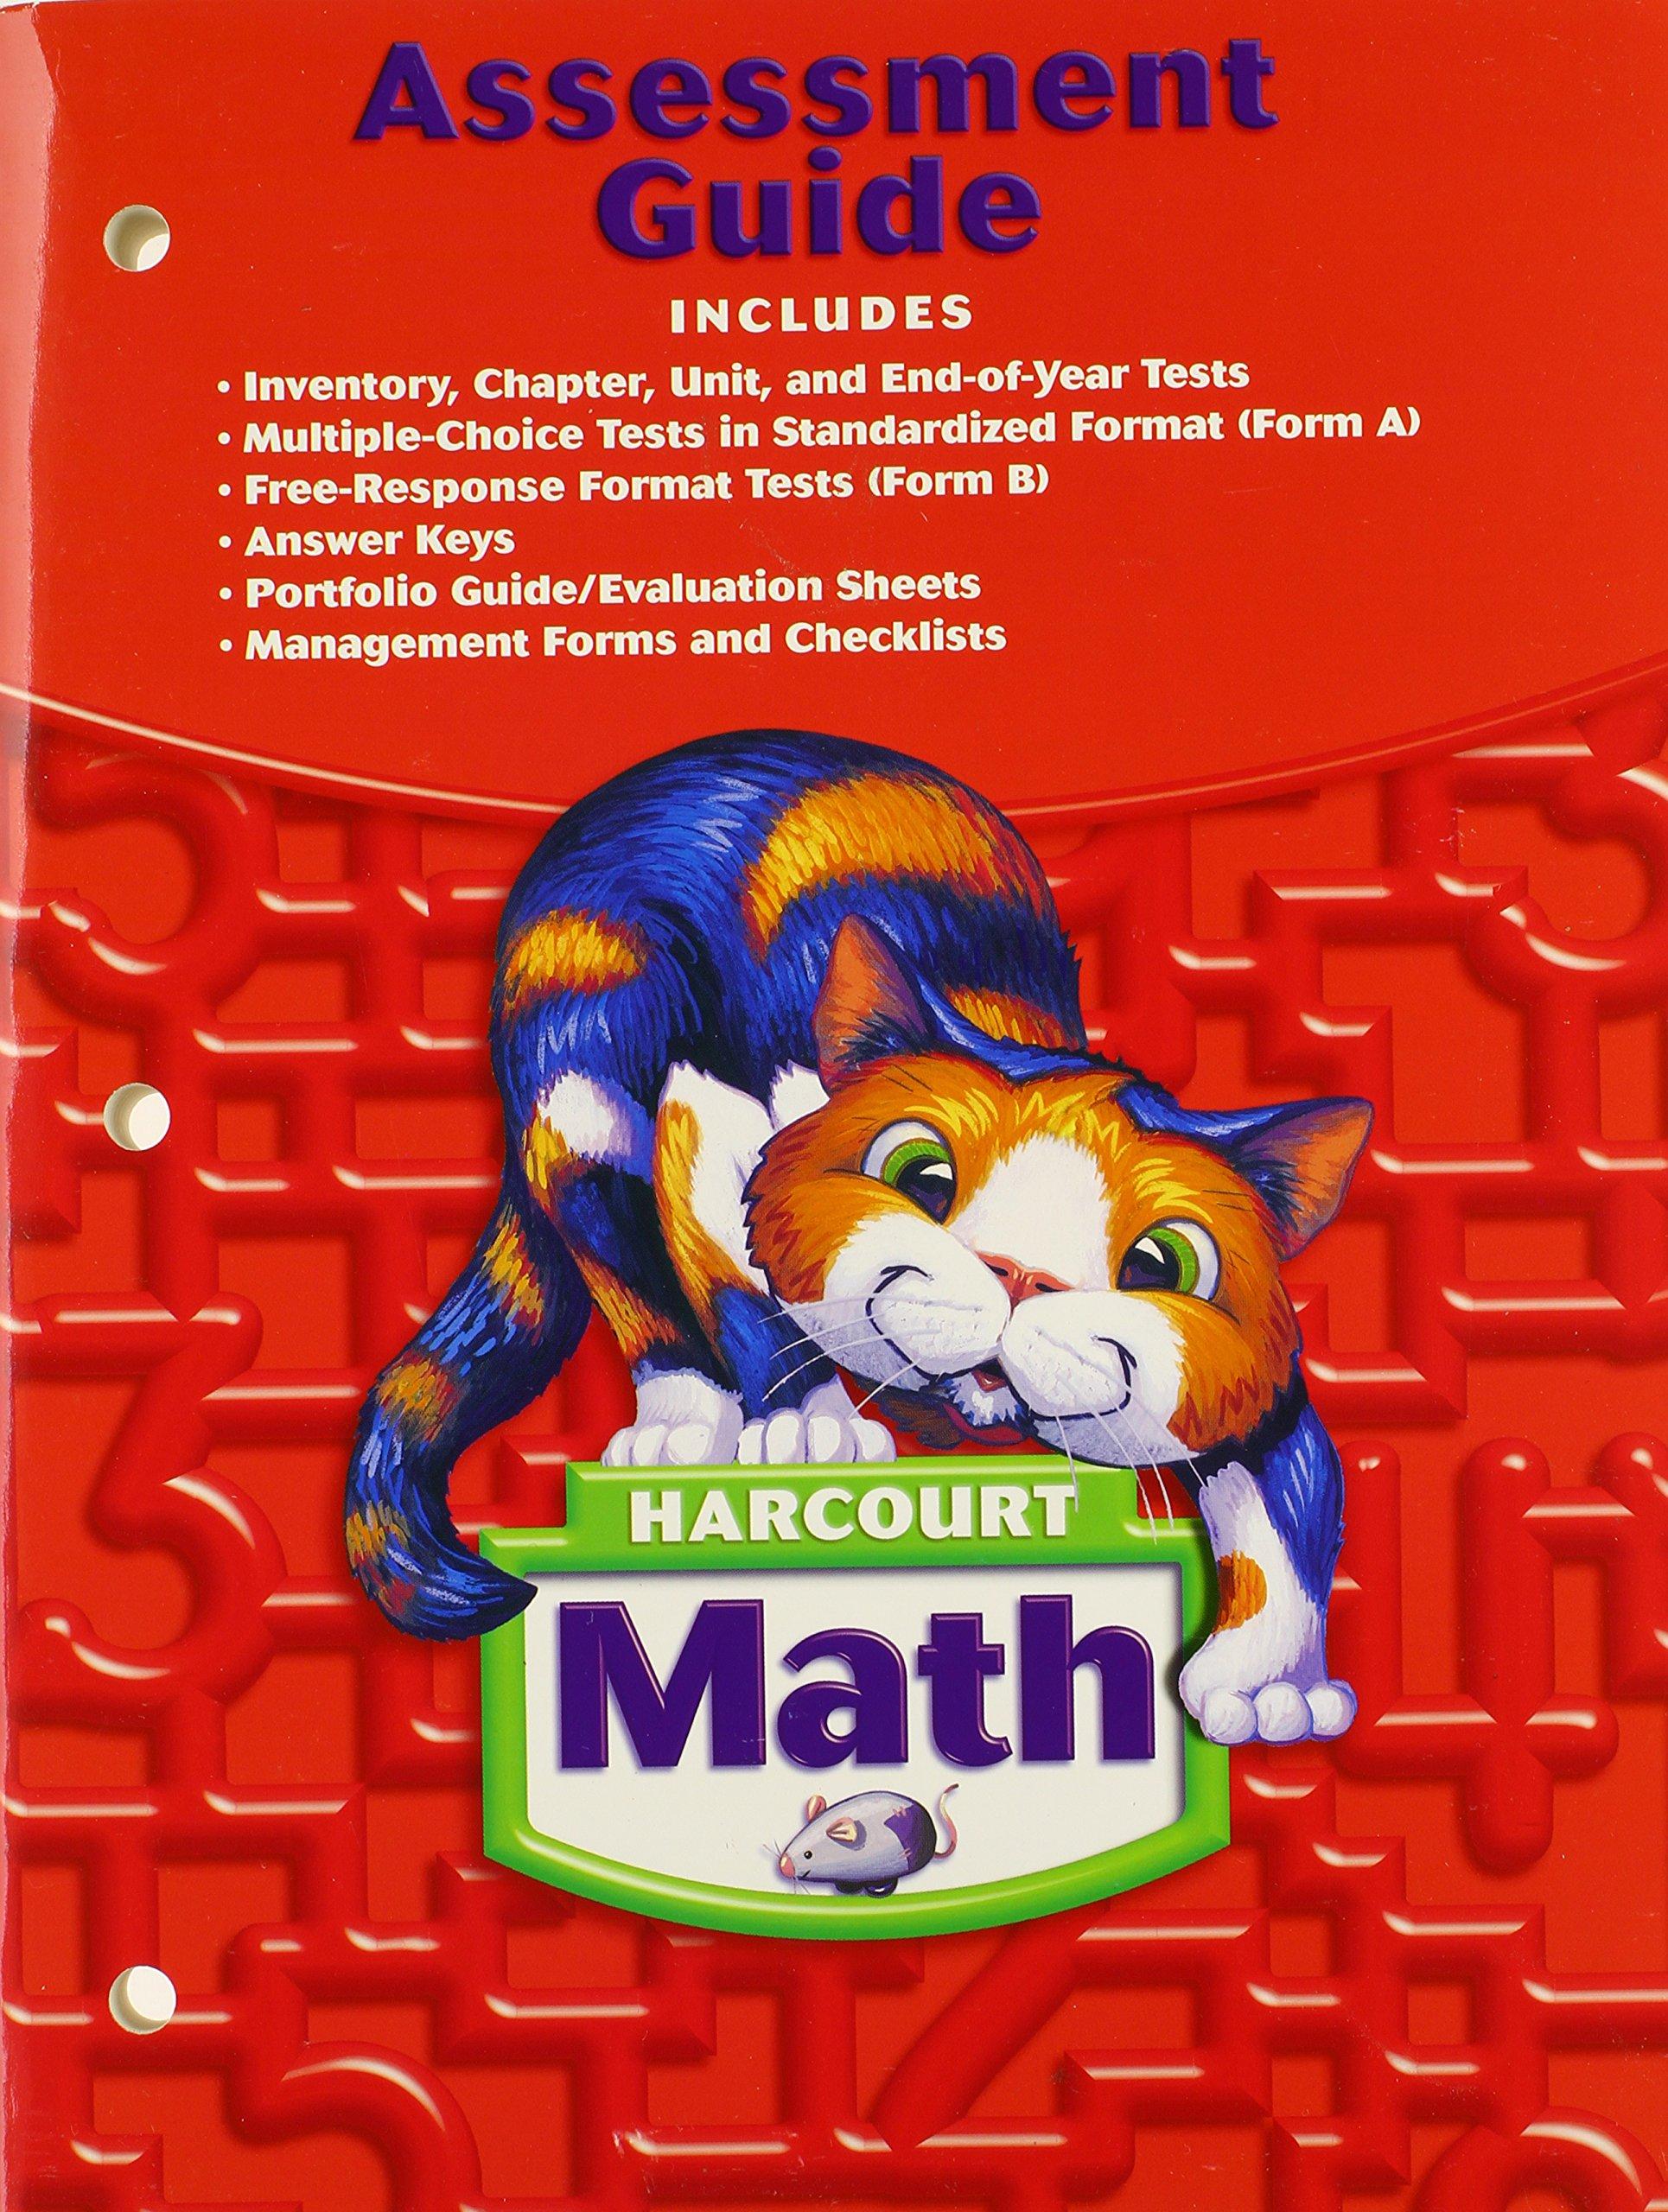 Harcourt Math: Assessment Guide Grade 2: 9780153365386: Amazon.com: Books